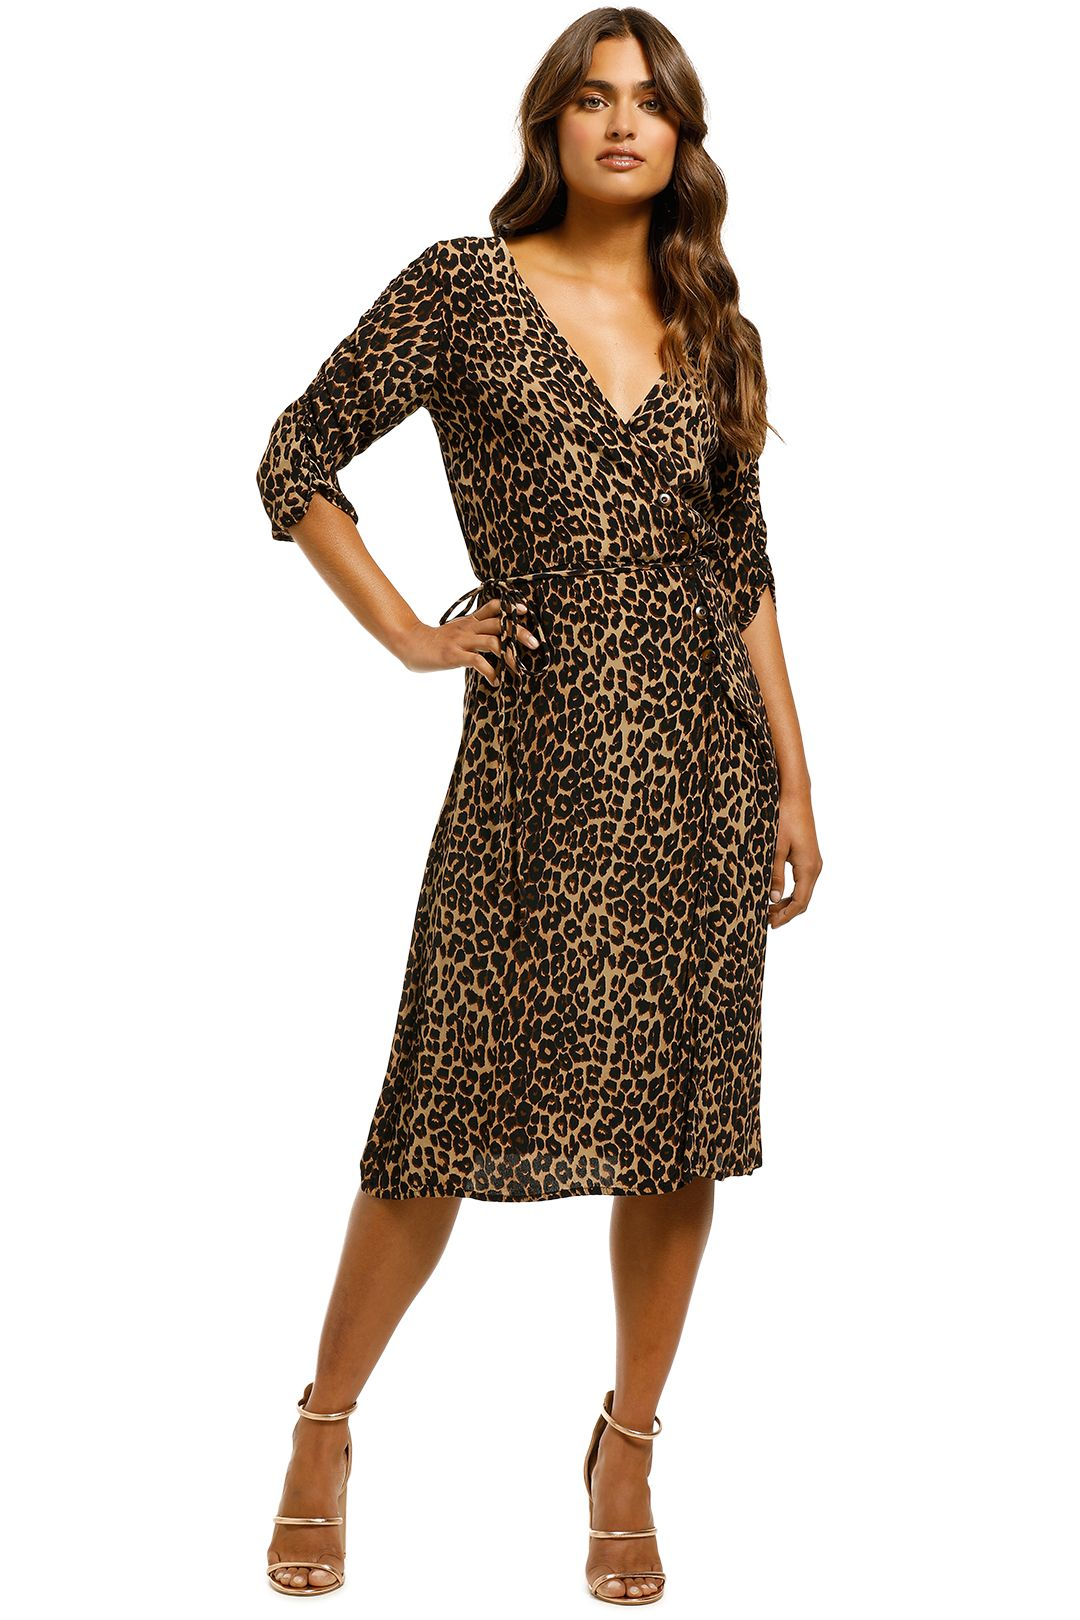 Faithfull the Brand - Anne Marie Midi Dress - Leopard Print - Front